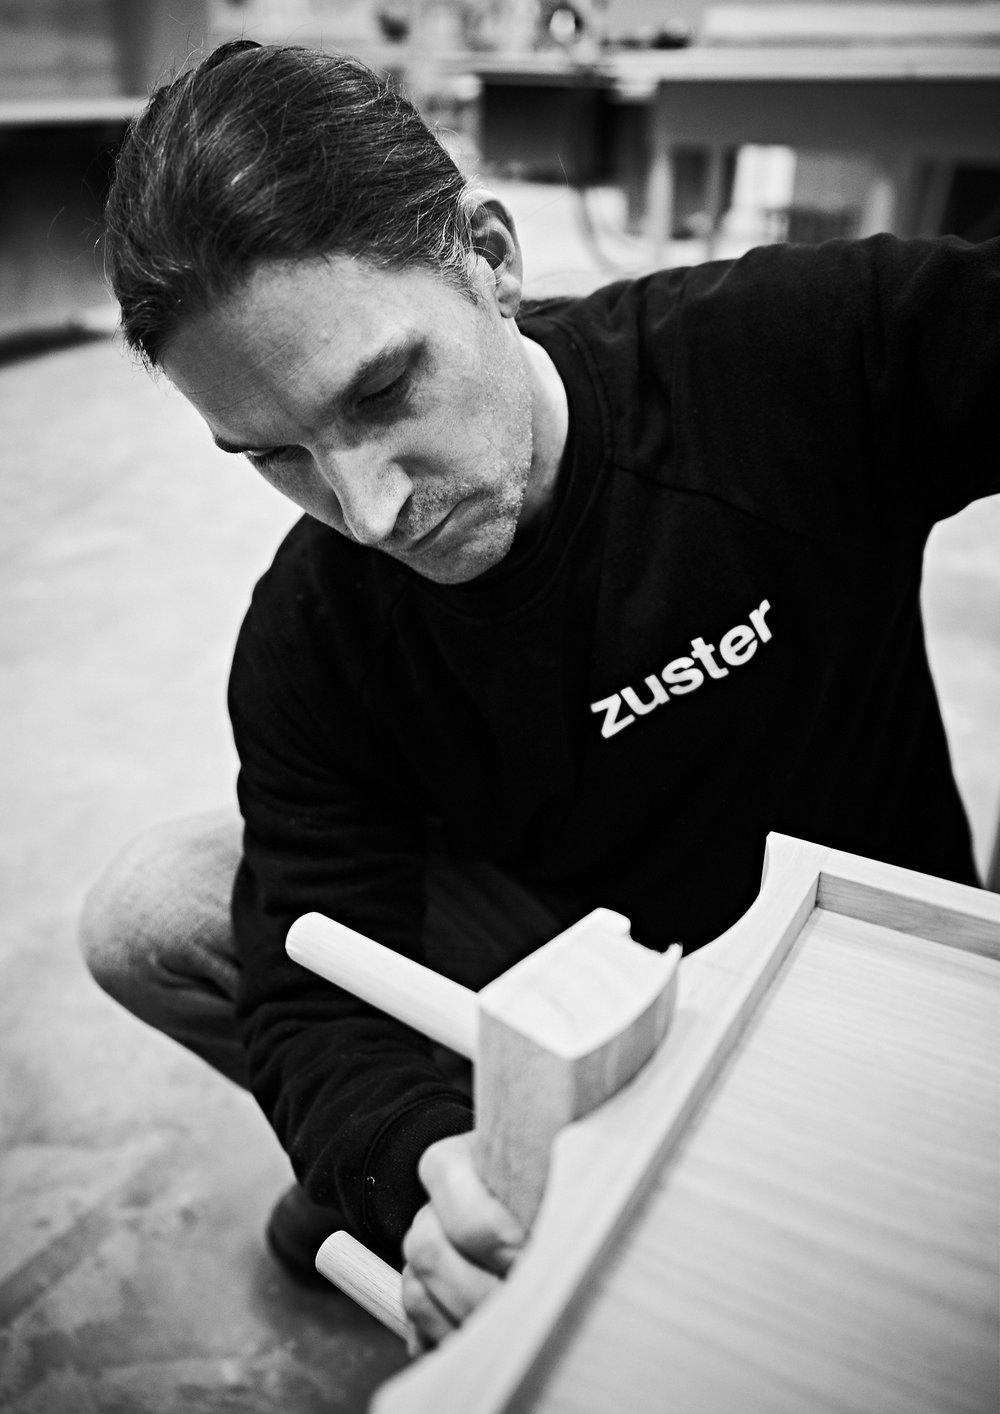 160728-Zuster-Workshop-010.jpg